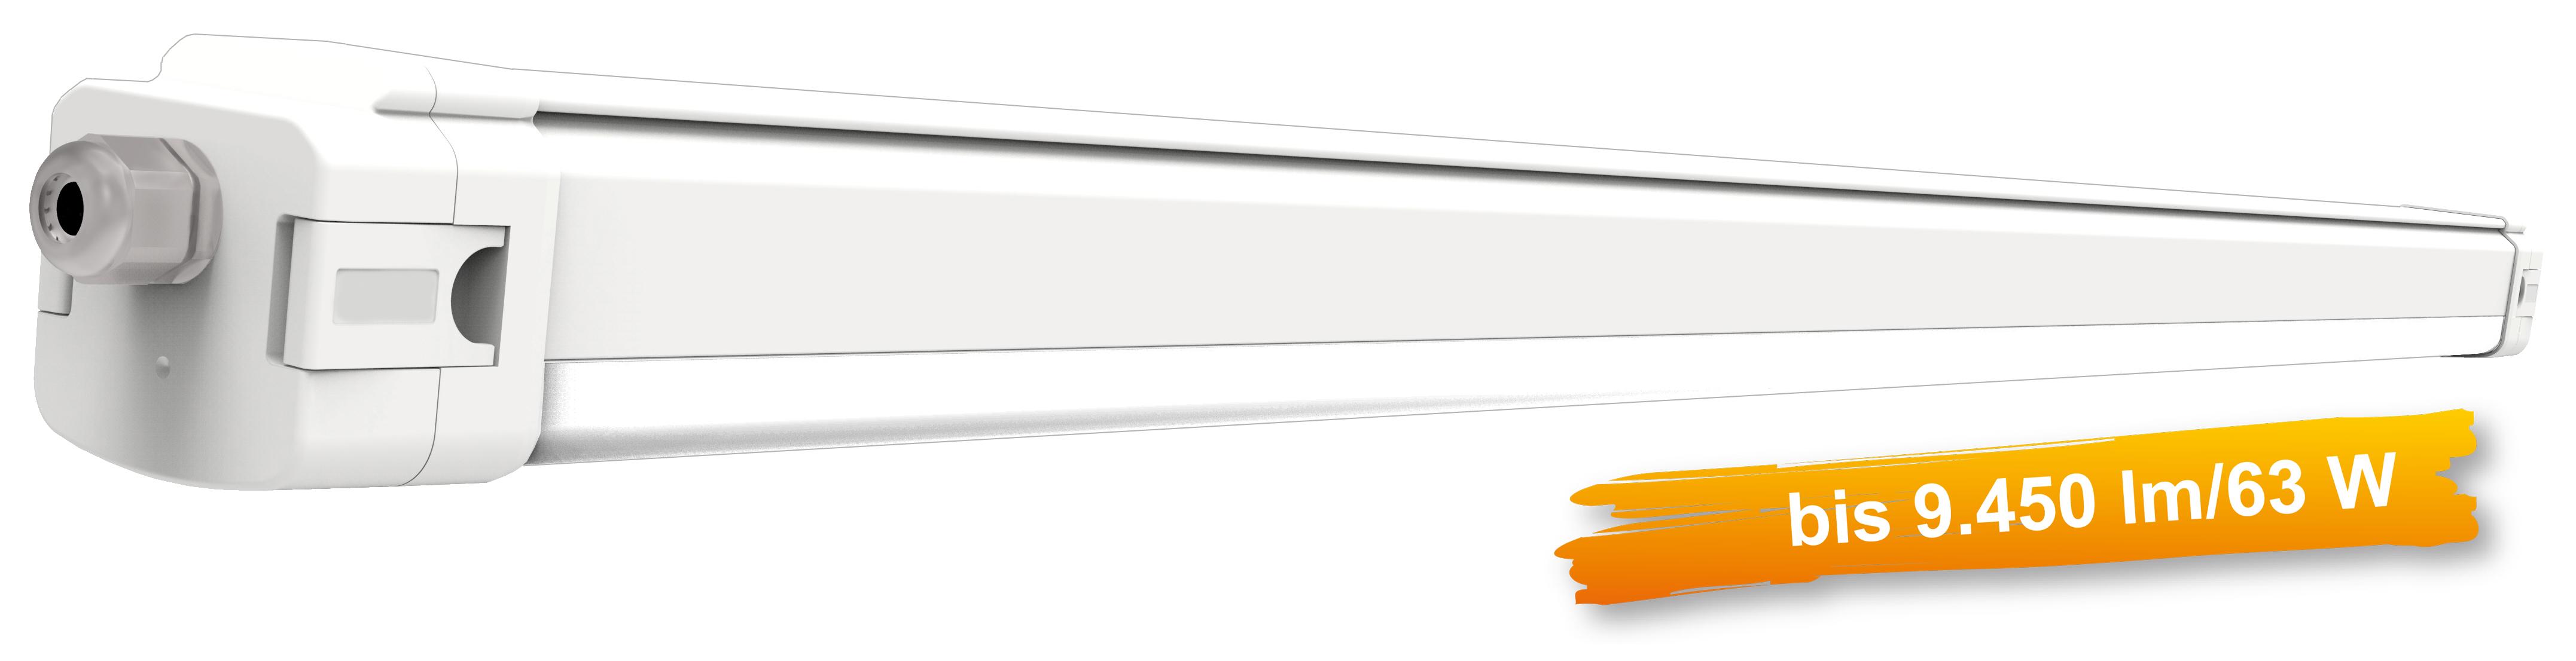 LEDAXO LED-Feuchtraumleuchte FL-11